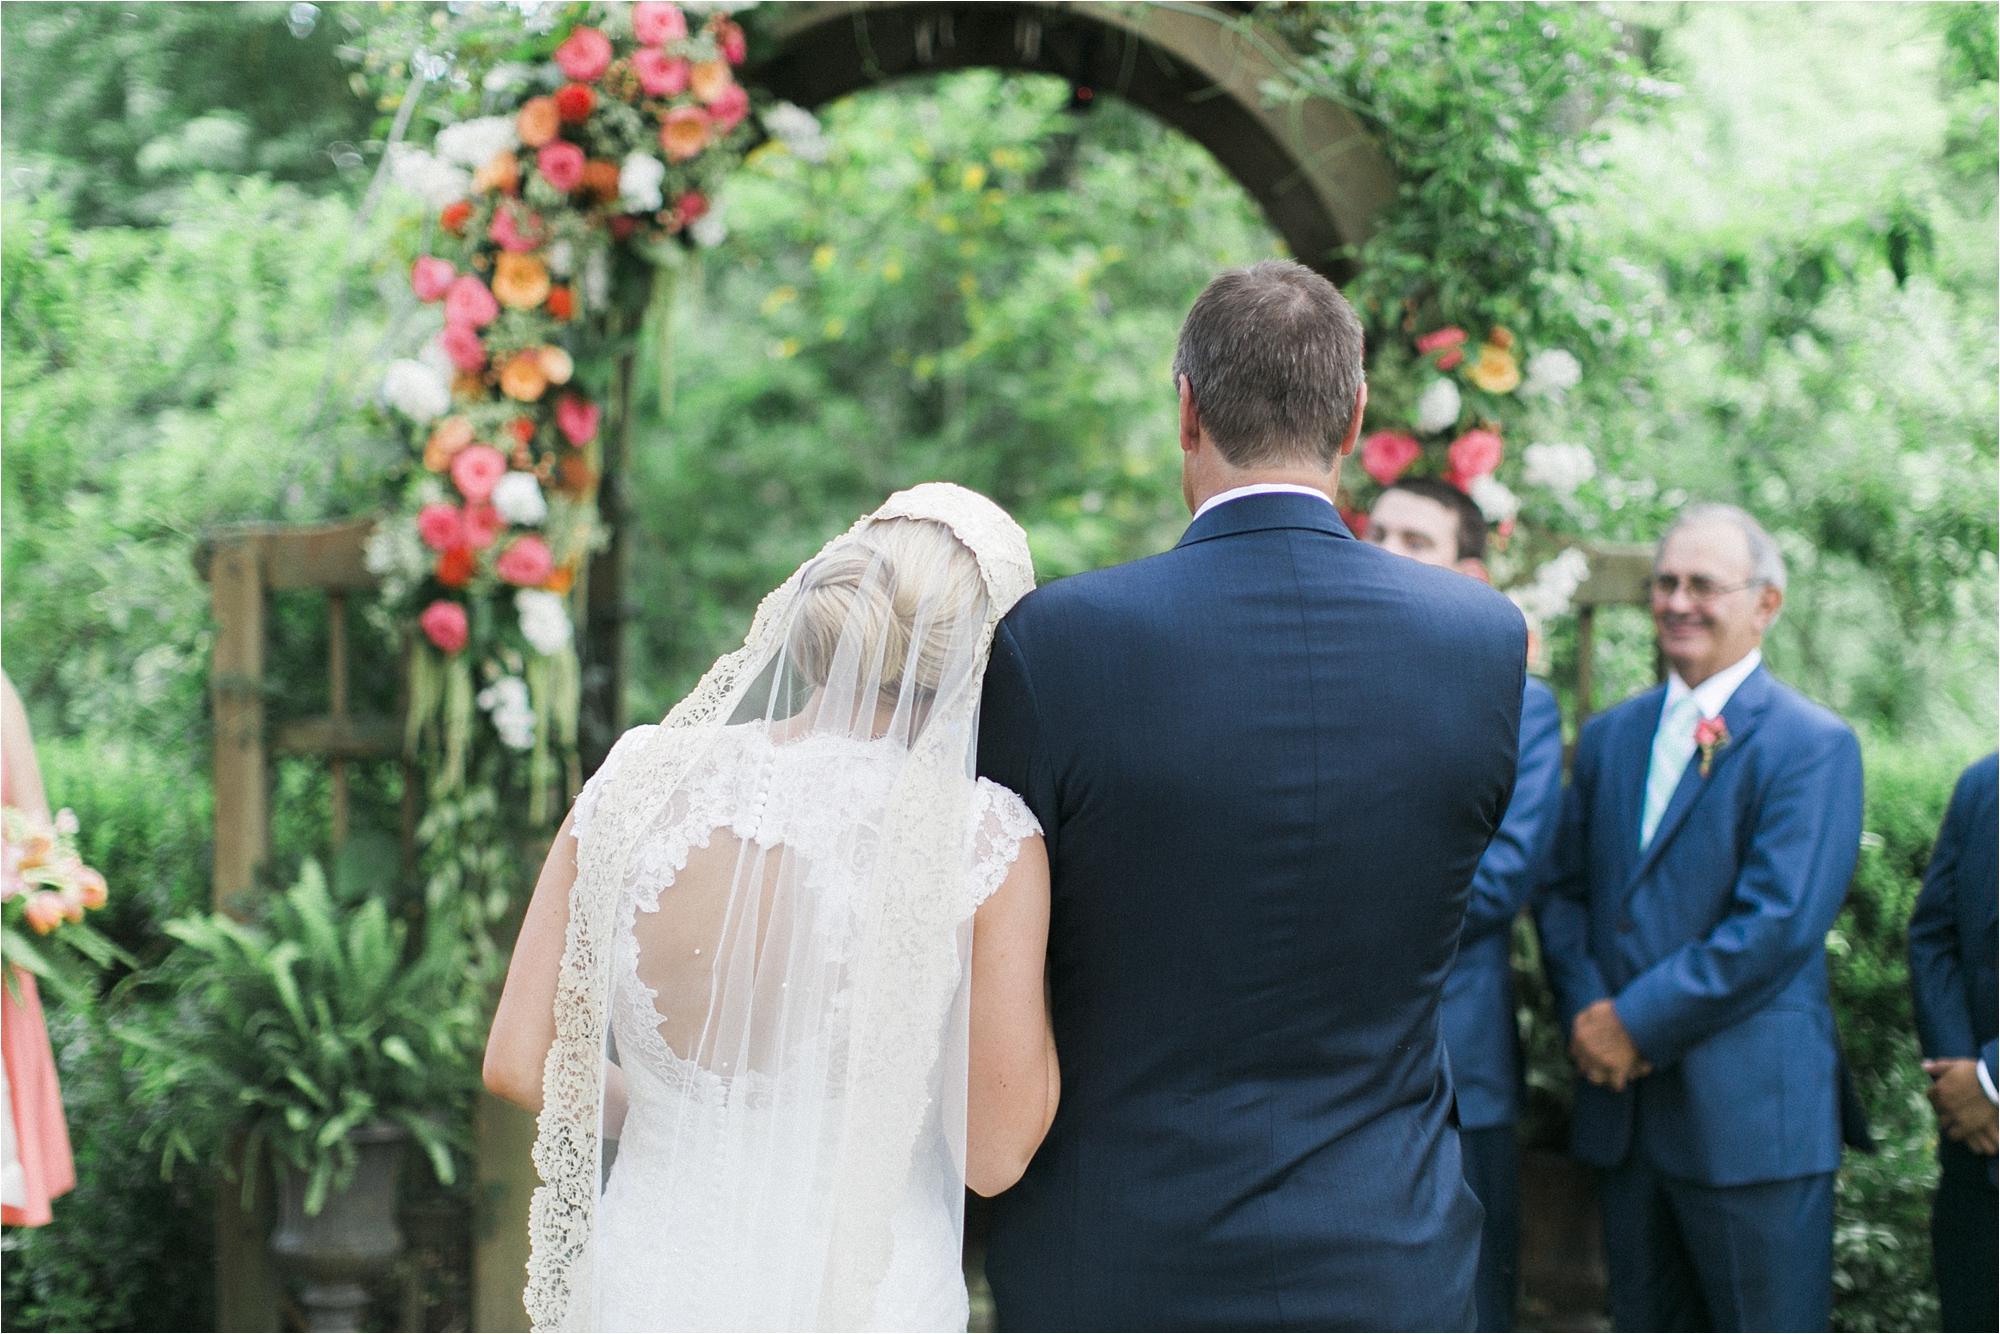 richmond-virginia-tuckahoe-plantation-coral-summer-wedding-stephanie-yonce-photos_0028.jpg